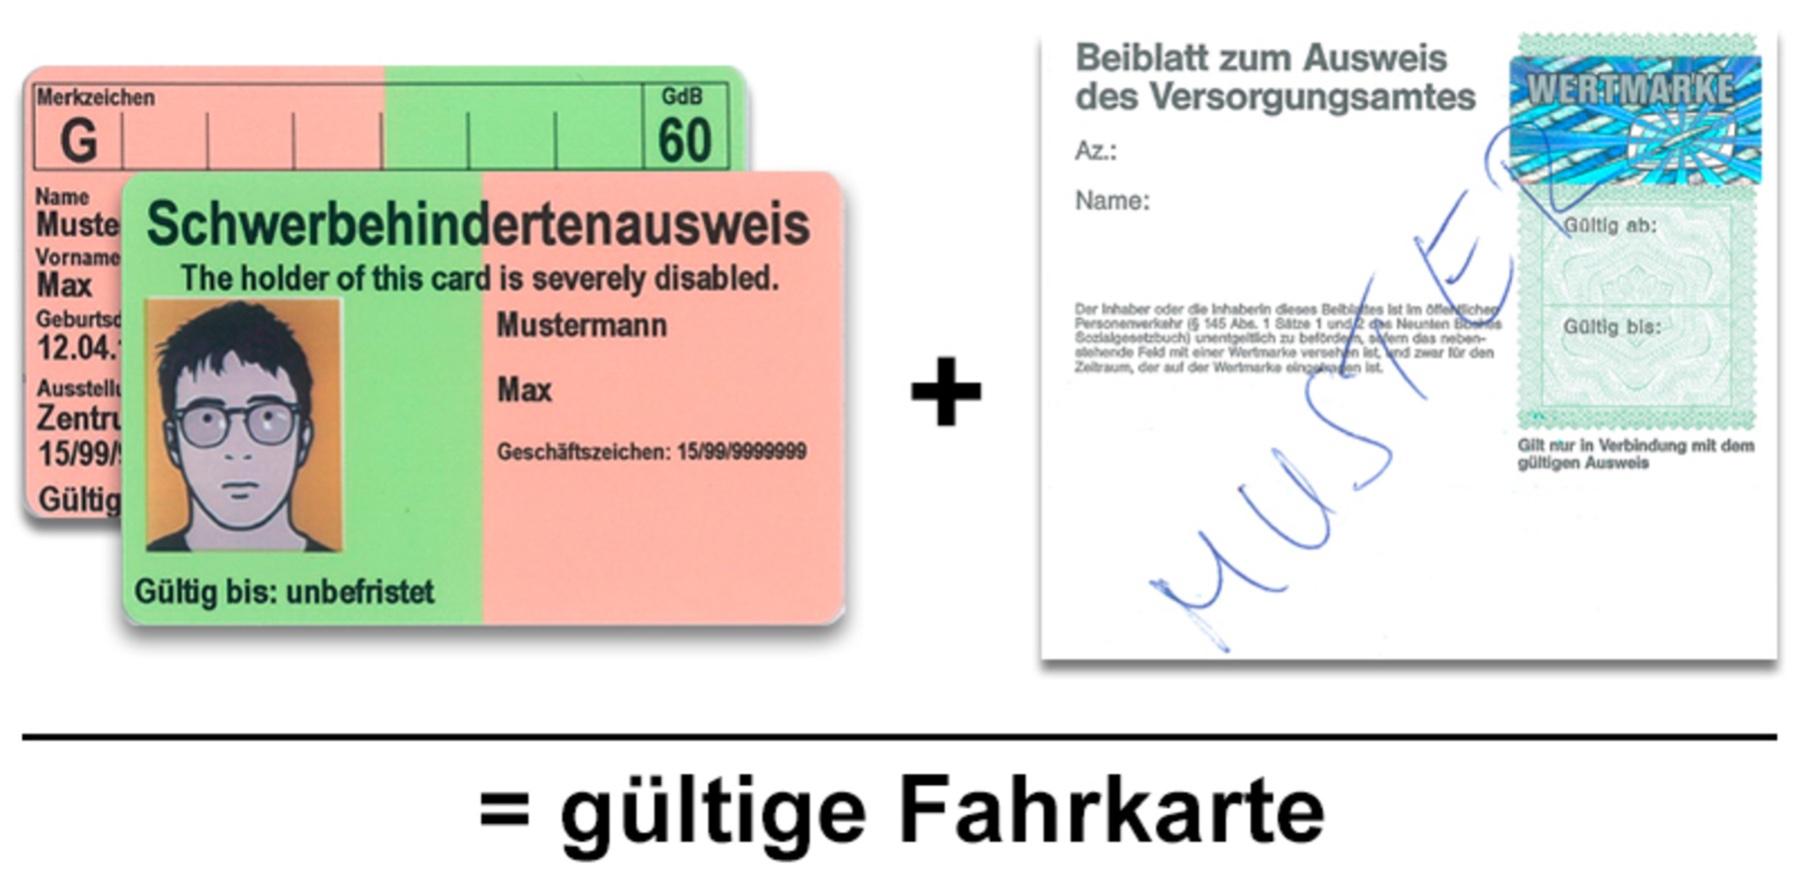 Schwerbehindertenausweis + Ausweisblatt mit Wertmarke = gültige Fahrkarte